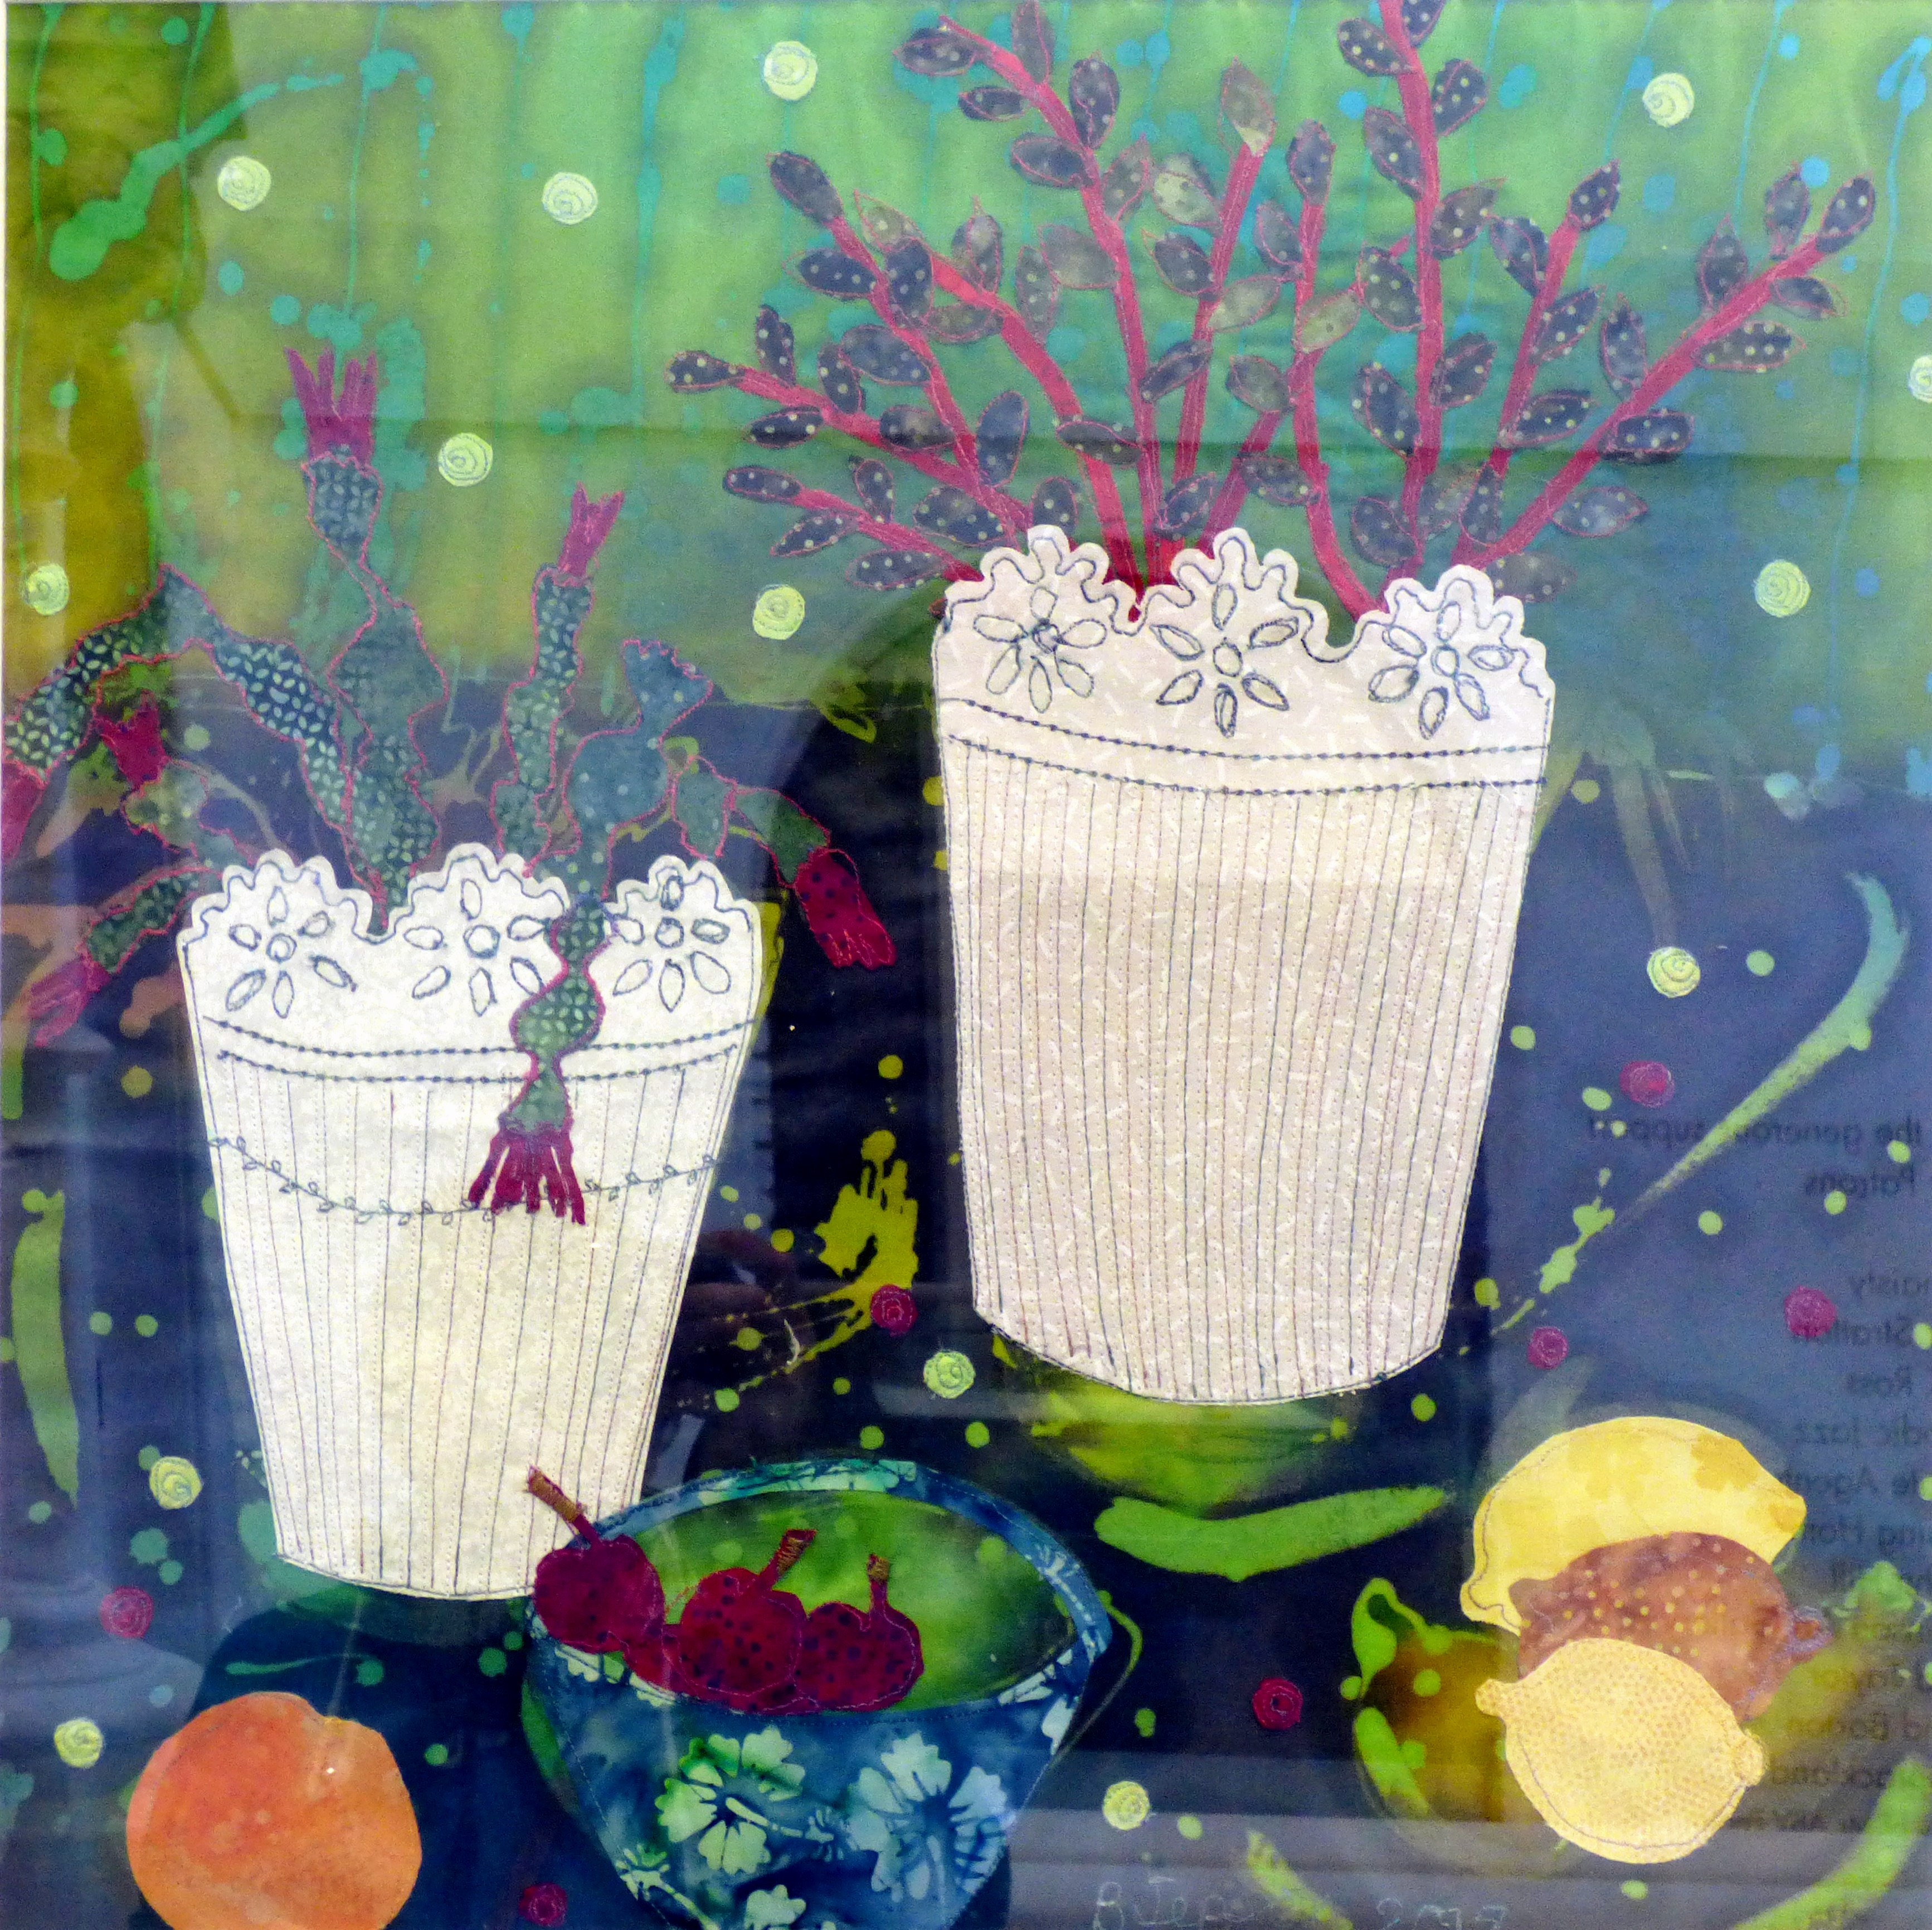 THREE LEMONS by Barbara Jepson, batik, applique & machine stitch, Ten Plus @ The Atkinson, 2018